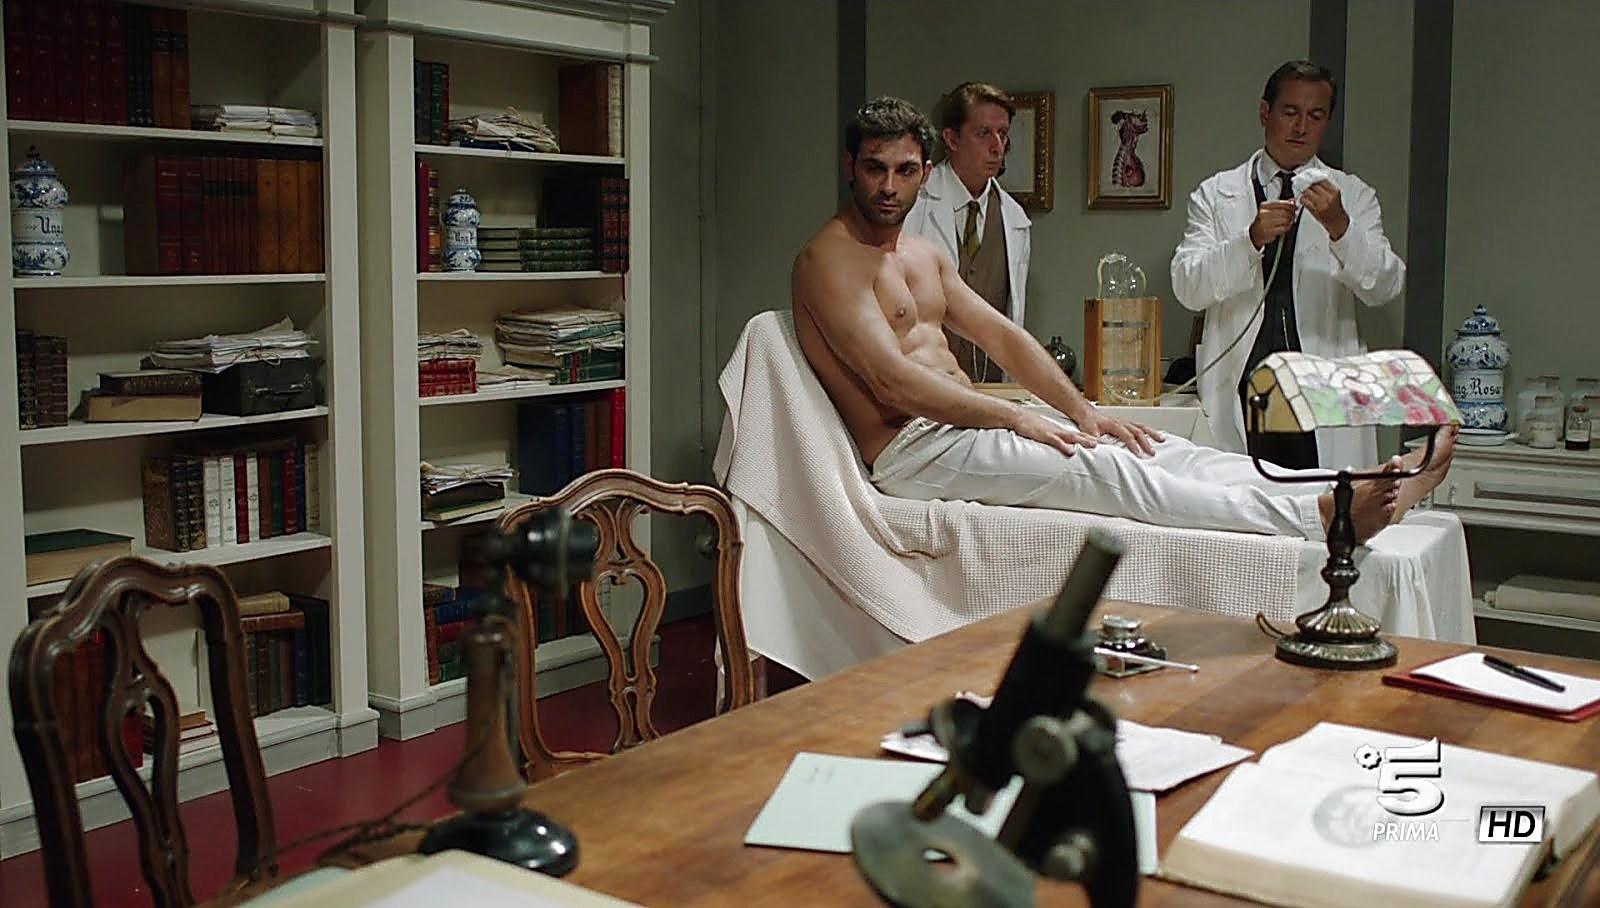 Francesco Arca sexy shirtless scene January 7, 2018, 1pm